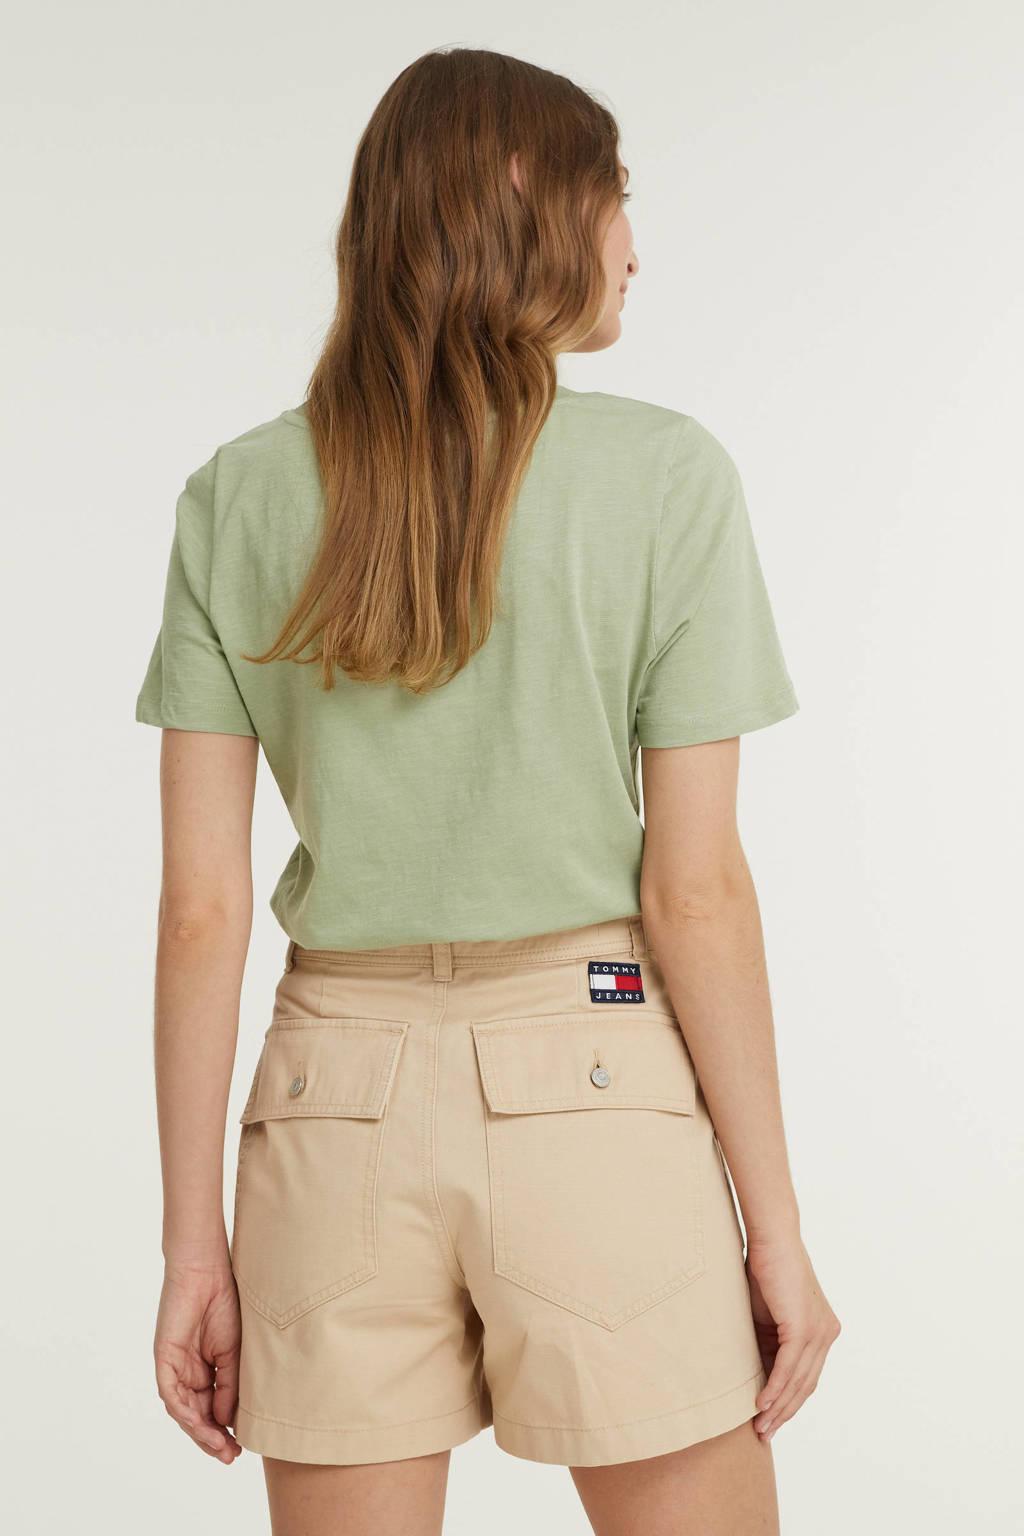 Tramontana T-shirt met printopdruk lichtgroen, Lichtgroen